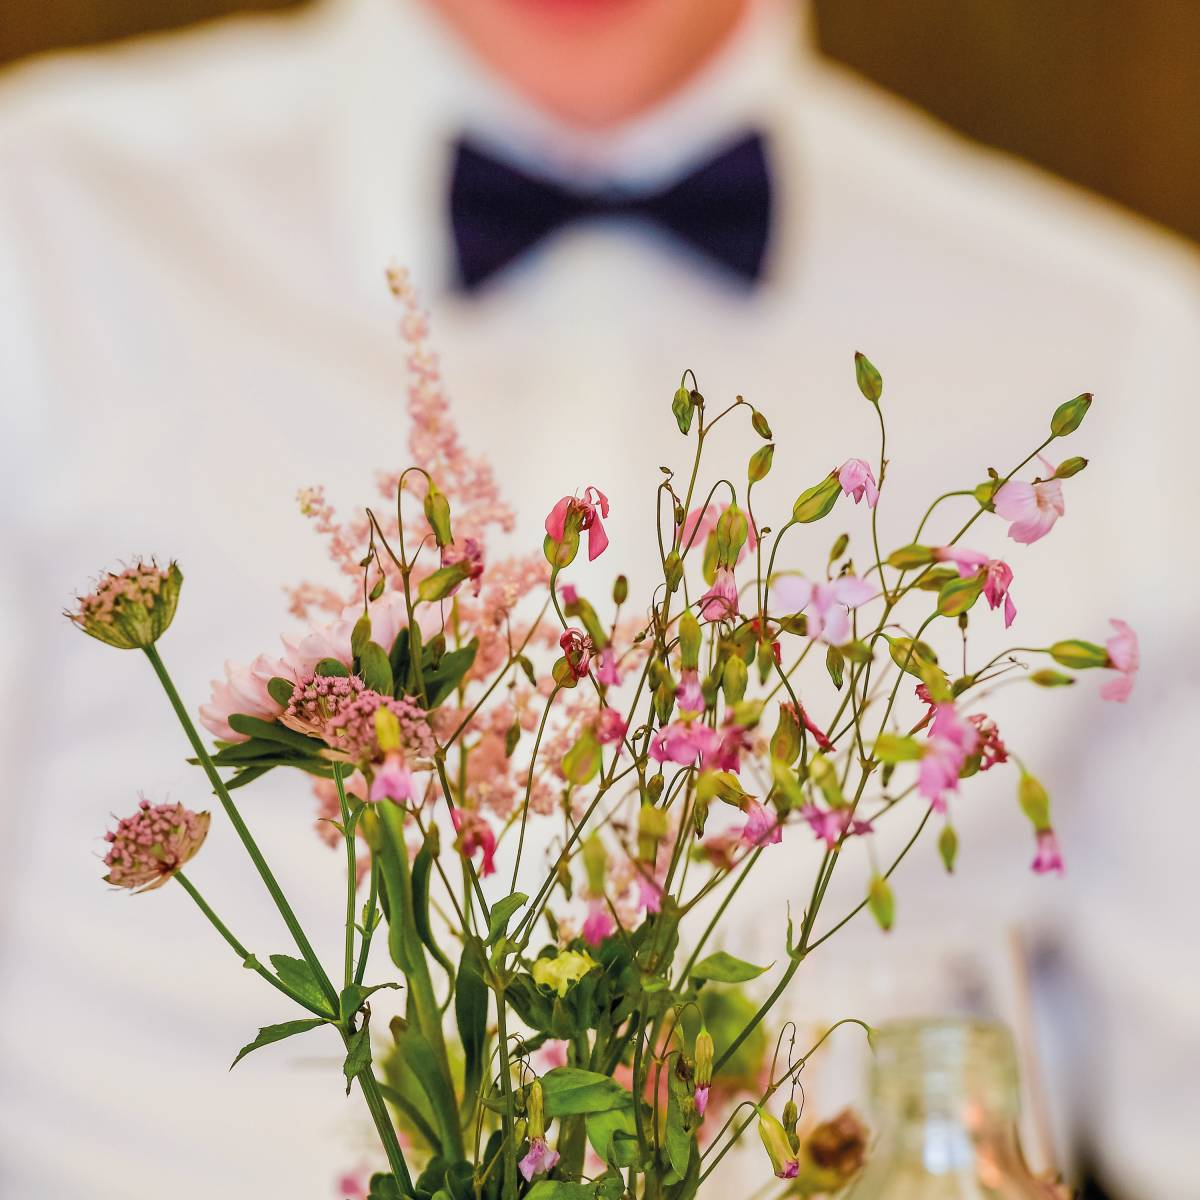 Silverspoon - Traiteur - Catering - Fotograaf MARTIN STEENHAUT - House of Weddings_07